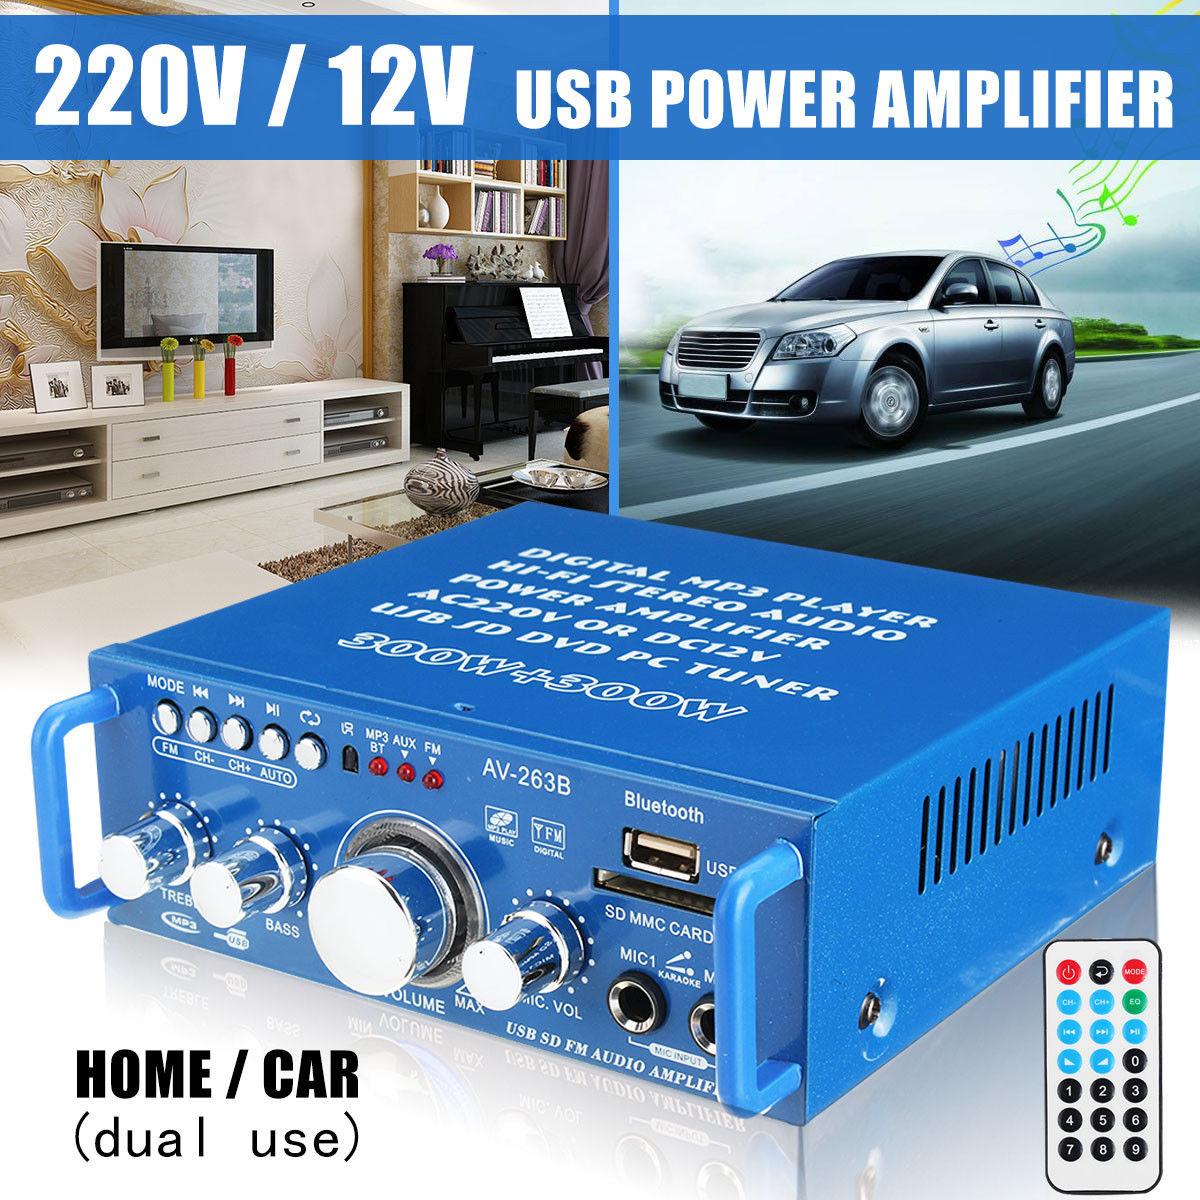 600W bluetooth 2CH Home Car Power Amplifier HiFi Stereo Audio Karaoke USB FM SD